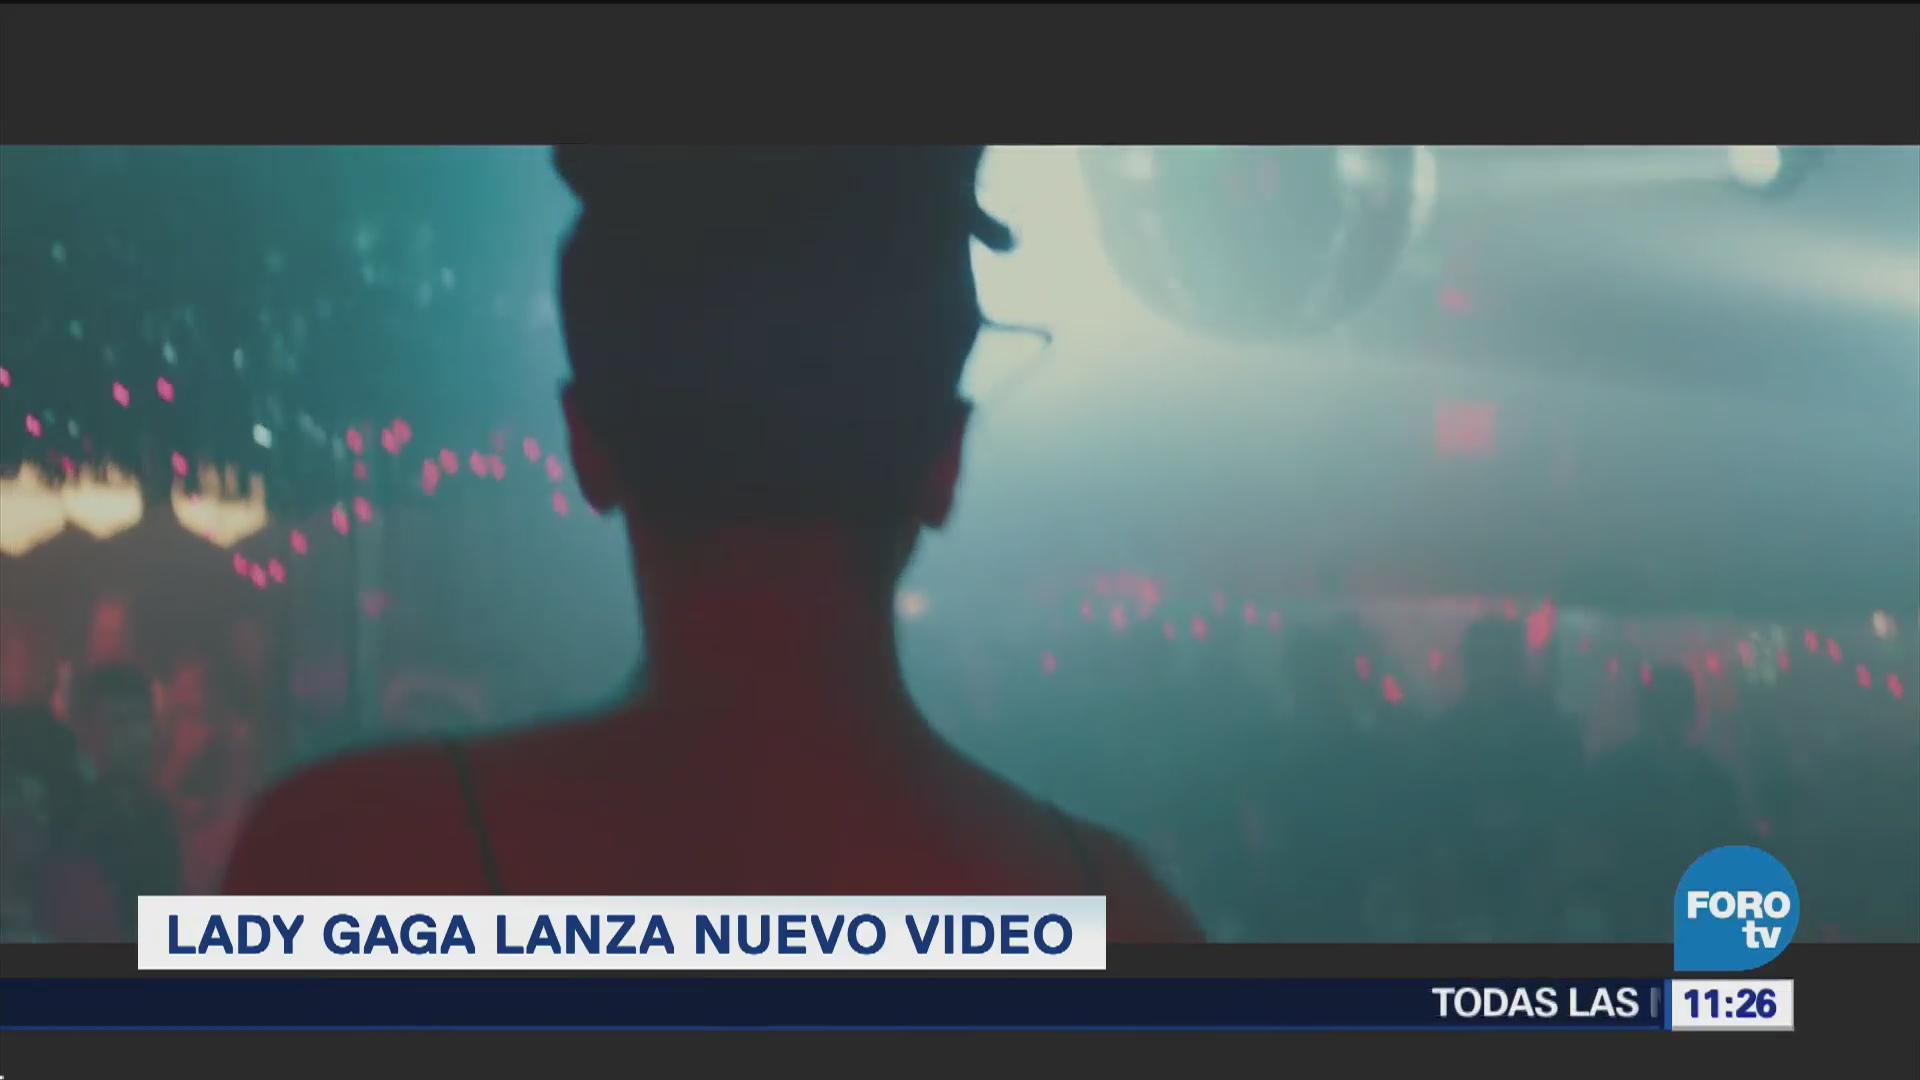 Lady Gaga estrena video del tema Shallow